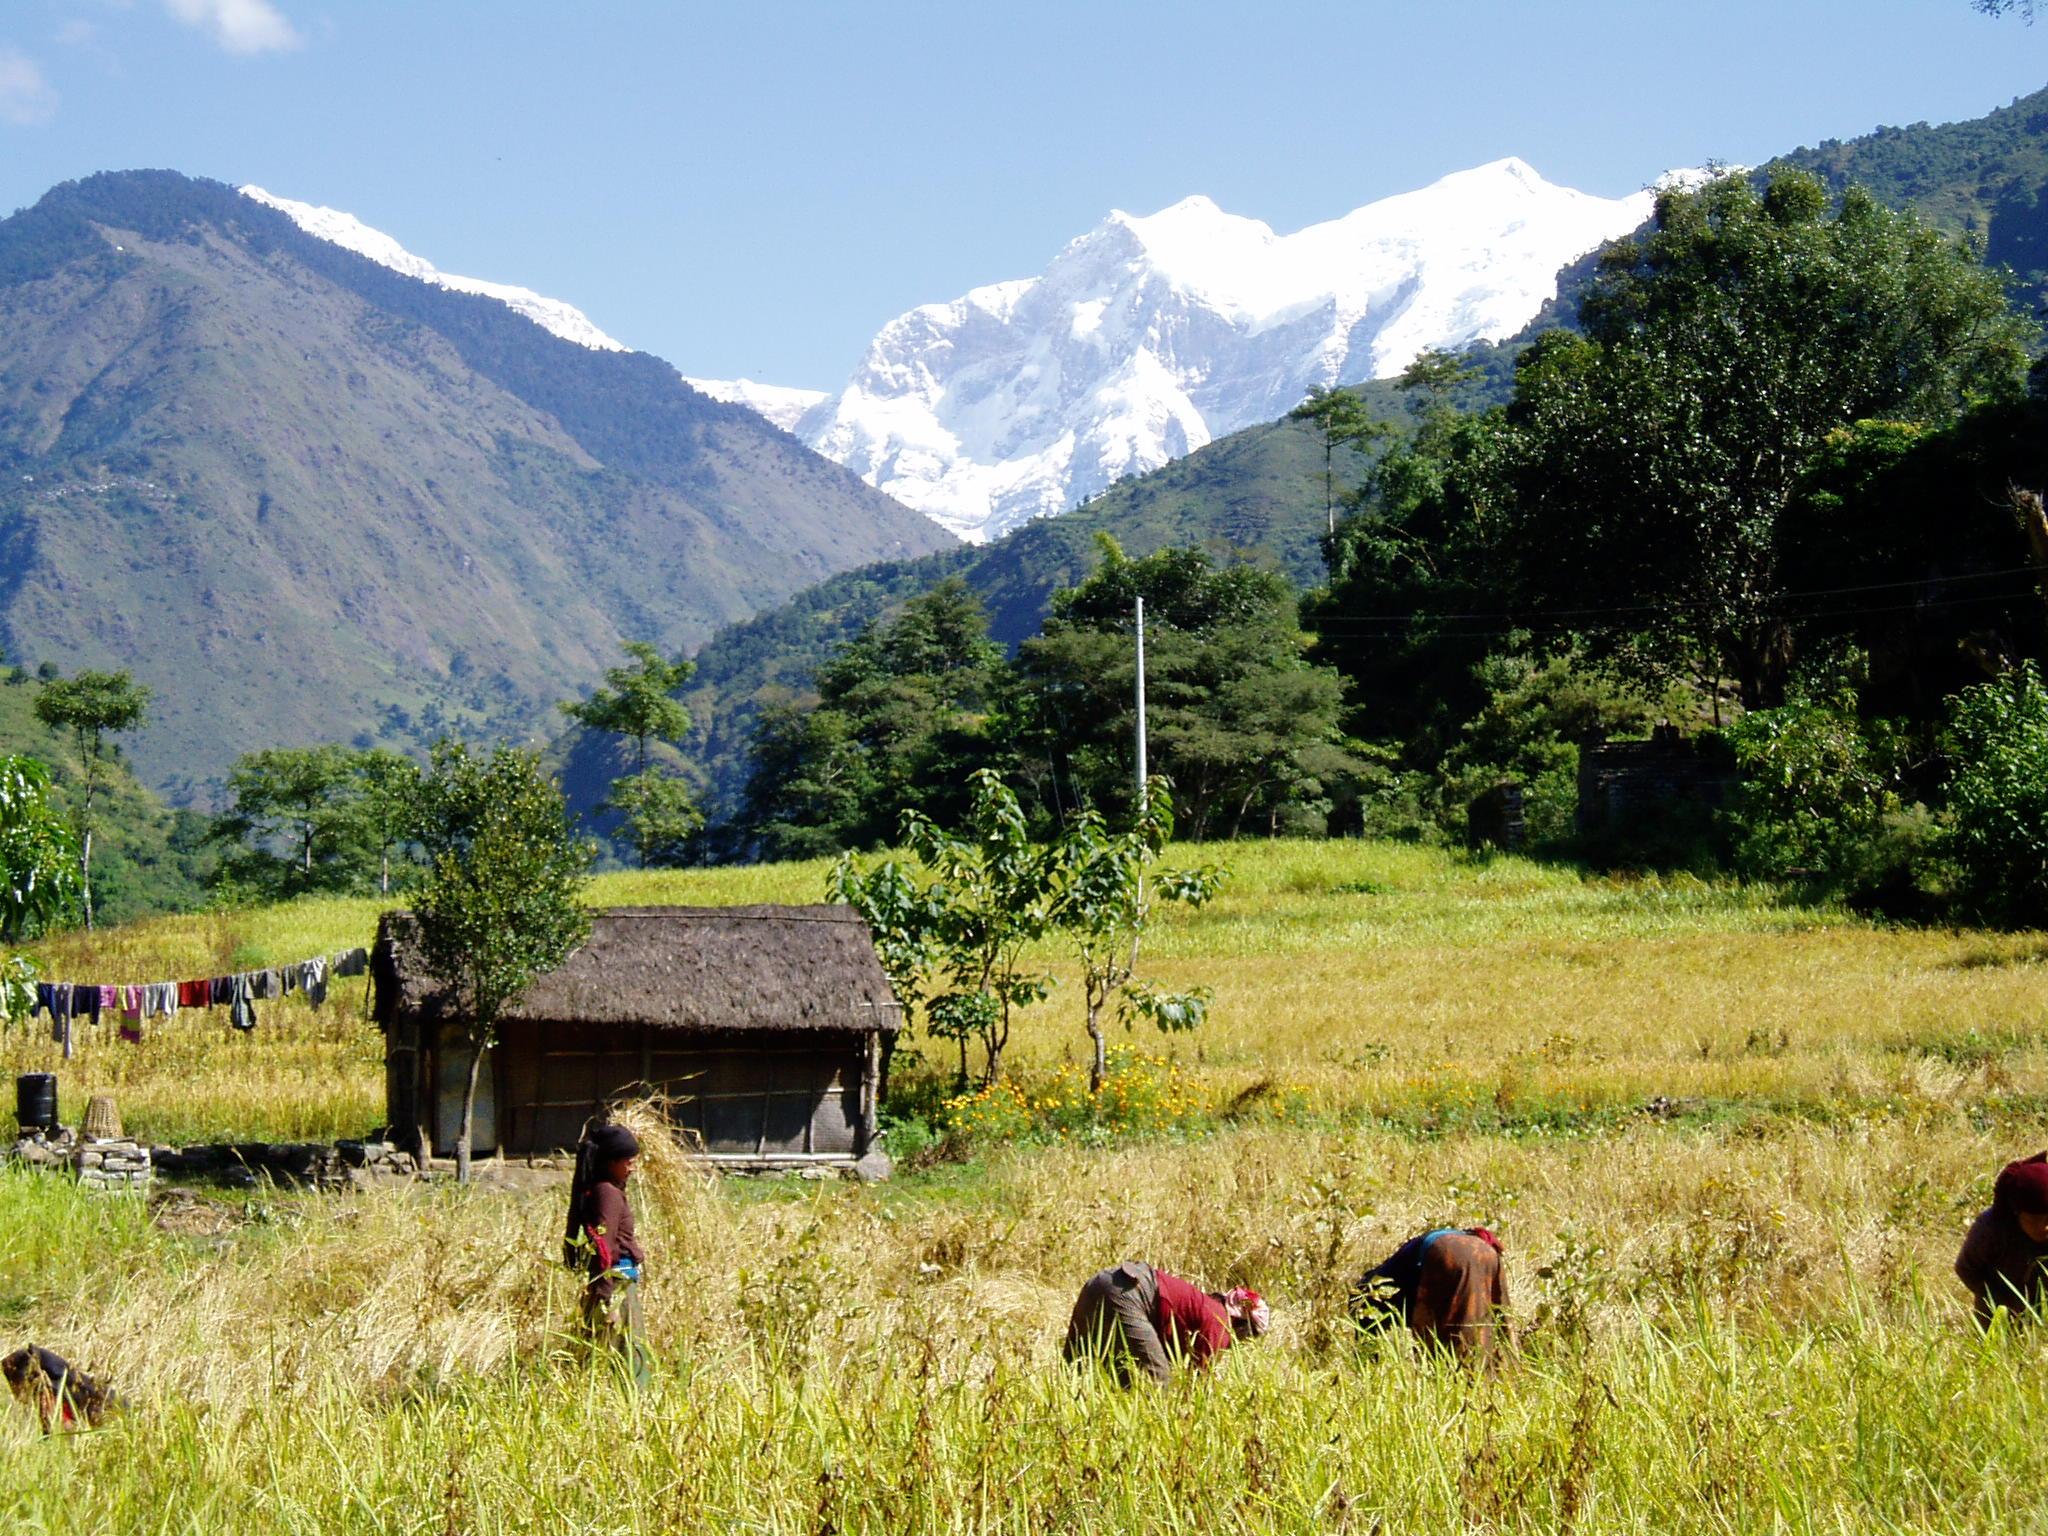 Ghorepani - Places around Annapurna Base Camp, annapurna base camp places to stay, accomodations around ABC trek, trekking to annapurna base camp